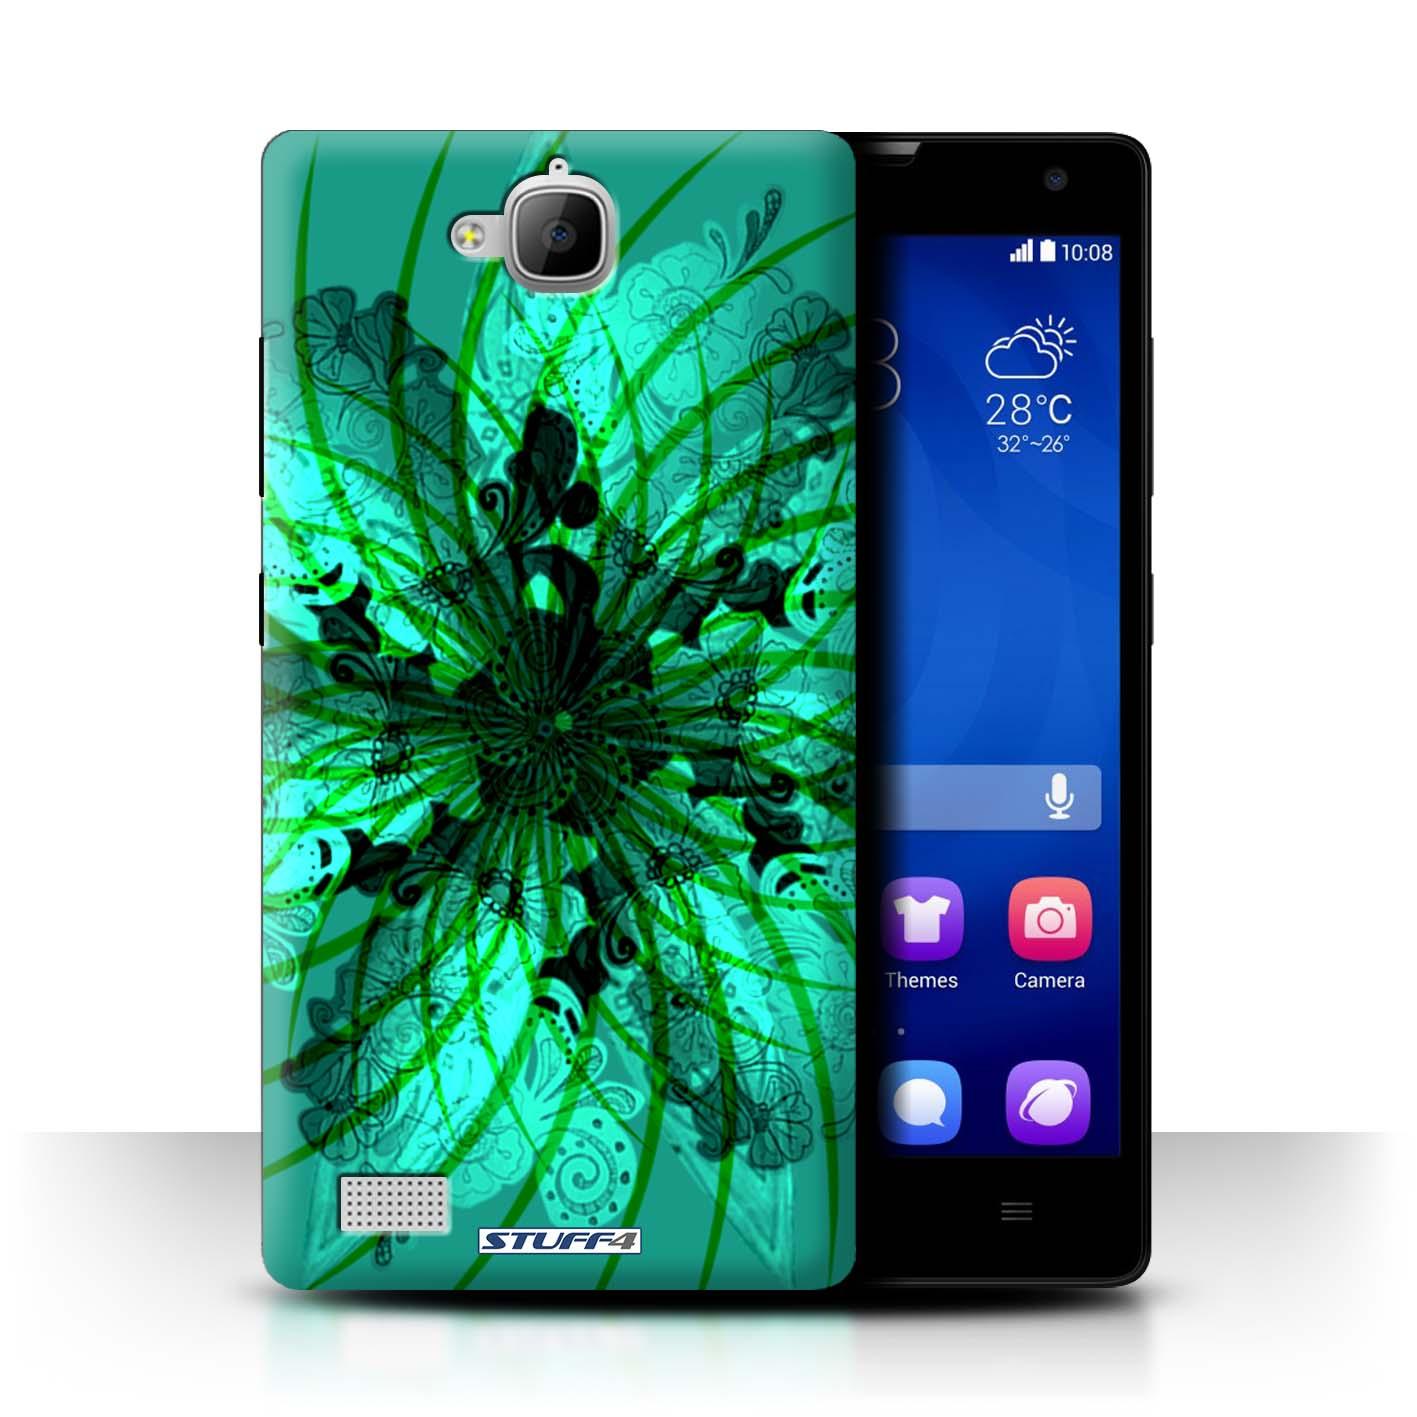 Stuff4-Funda-para-telefono-para-Huawei-Honrar-Smartphone-simetria-estampado